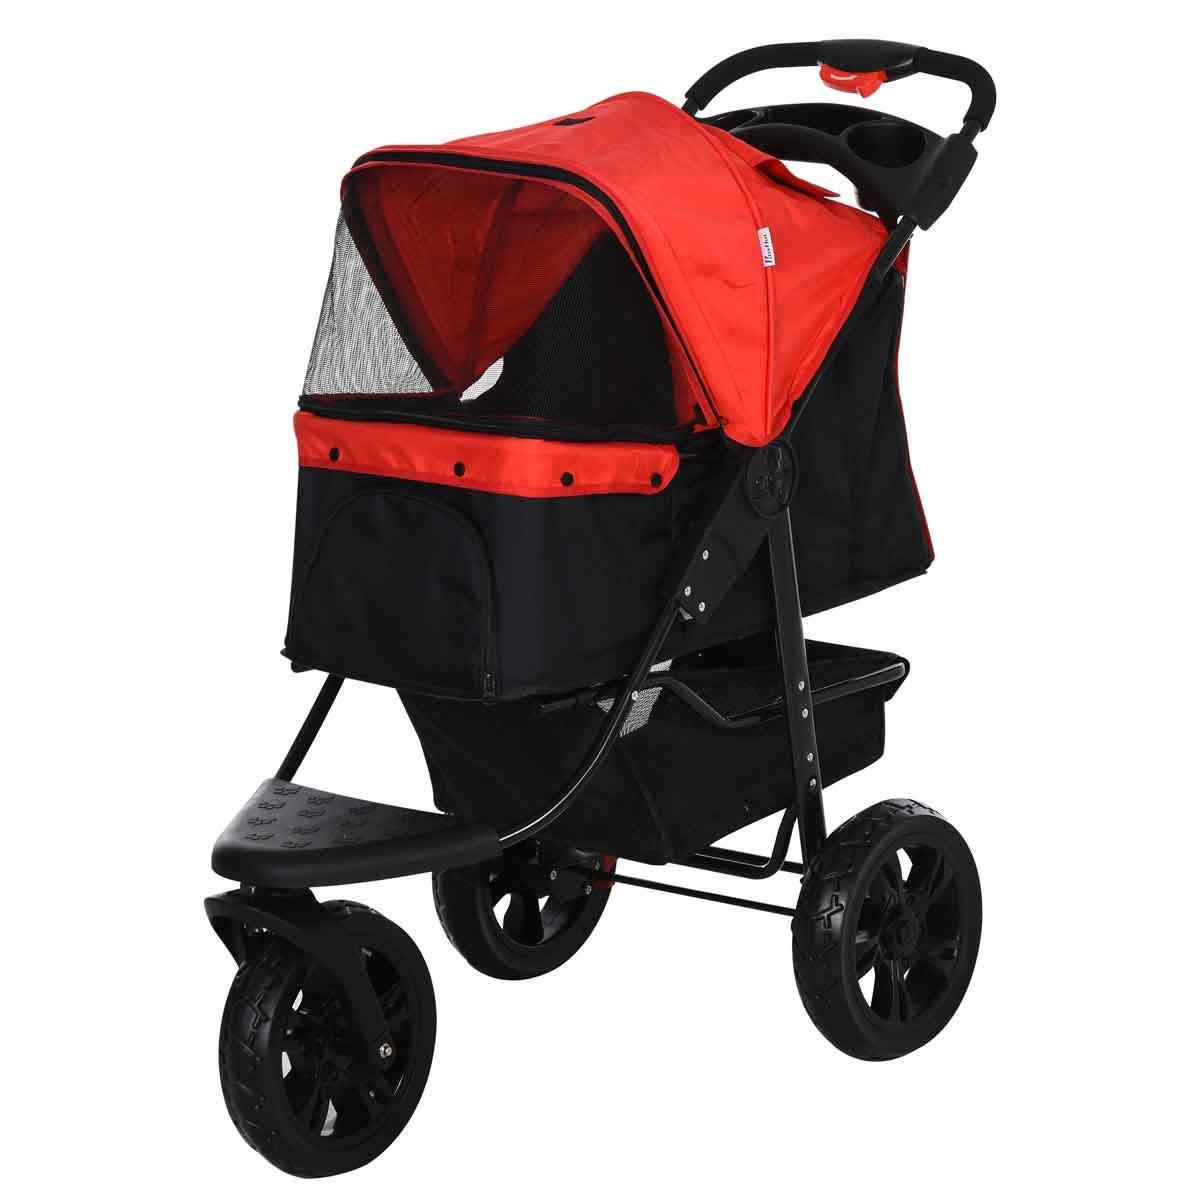 PawHut Folding 3 Wheel Pet Stroller for Travel w/ Adjustable Canopy & Storage - Red & Black